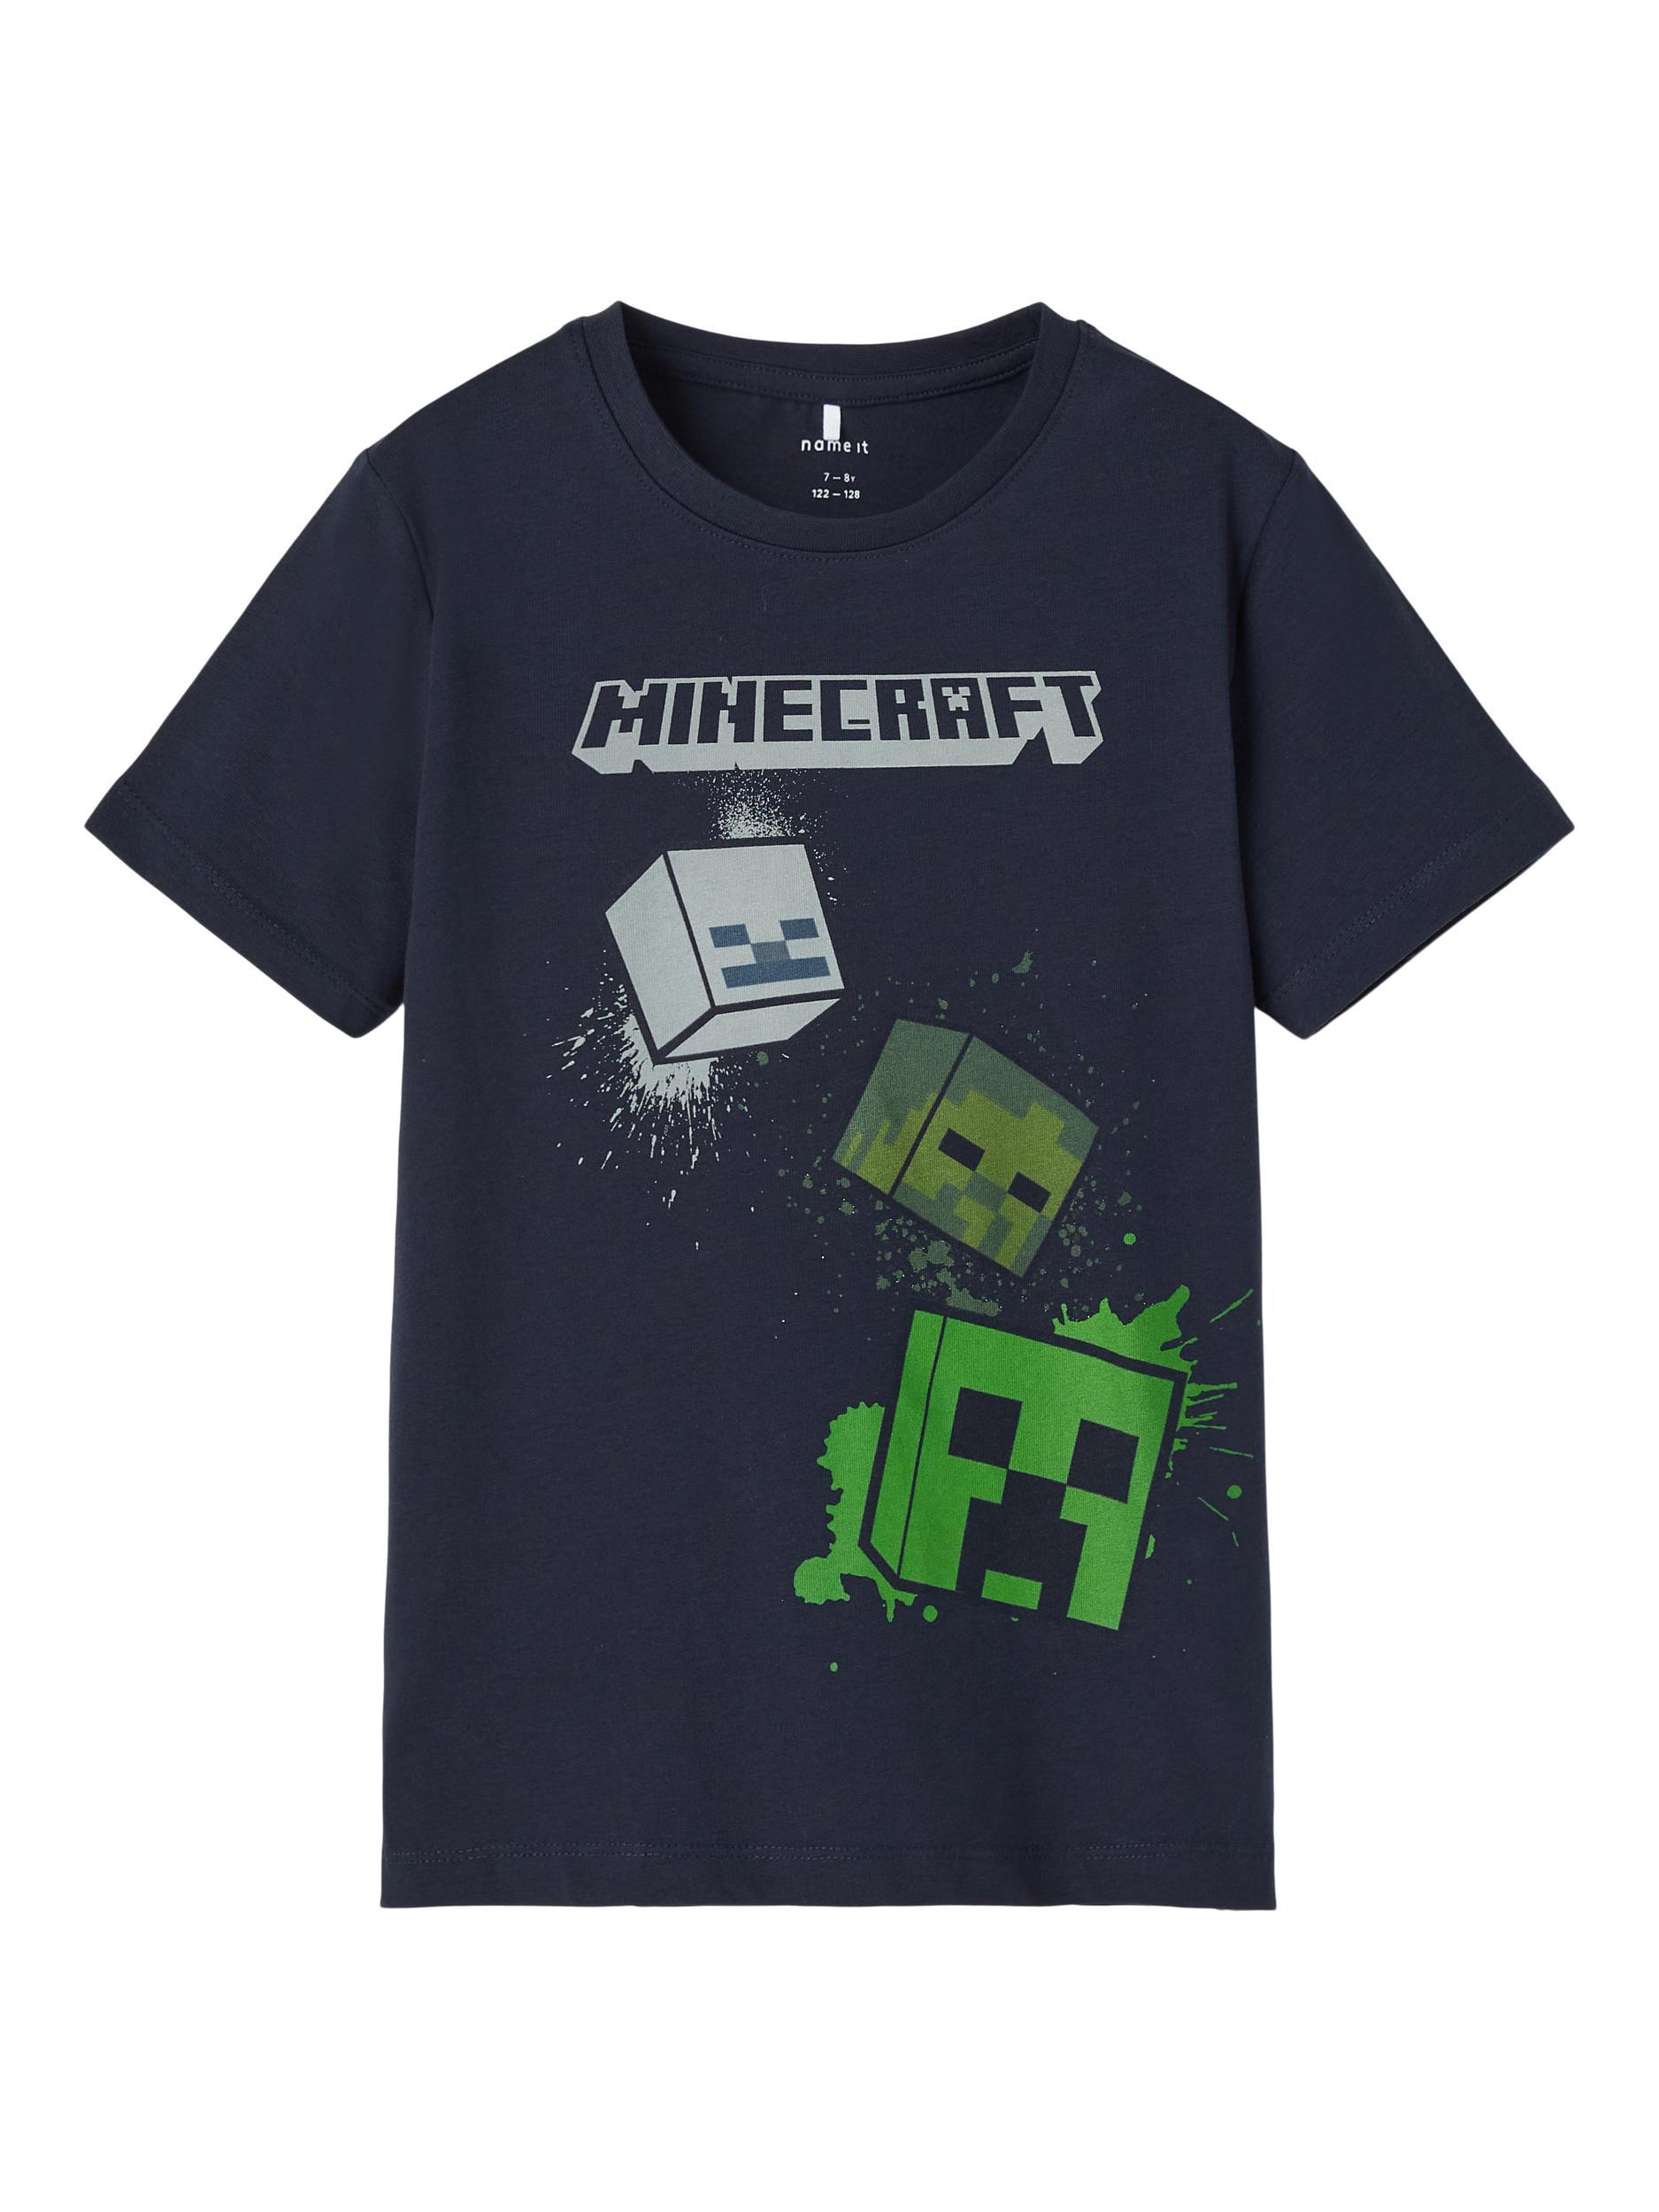 Name It Minecraft t-shirt